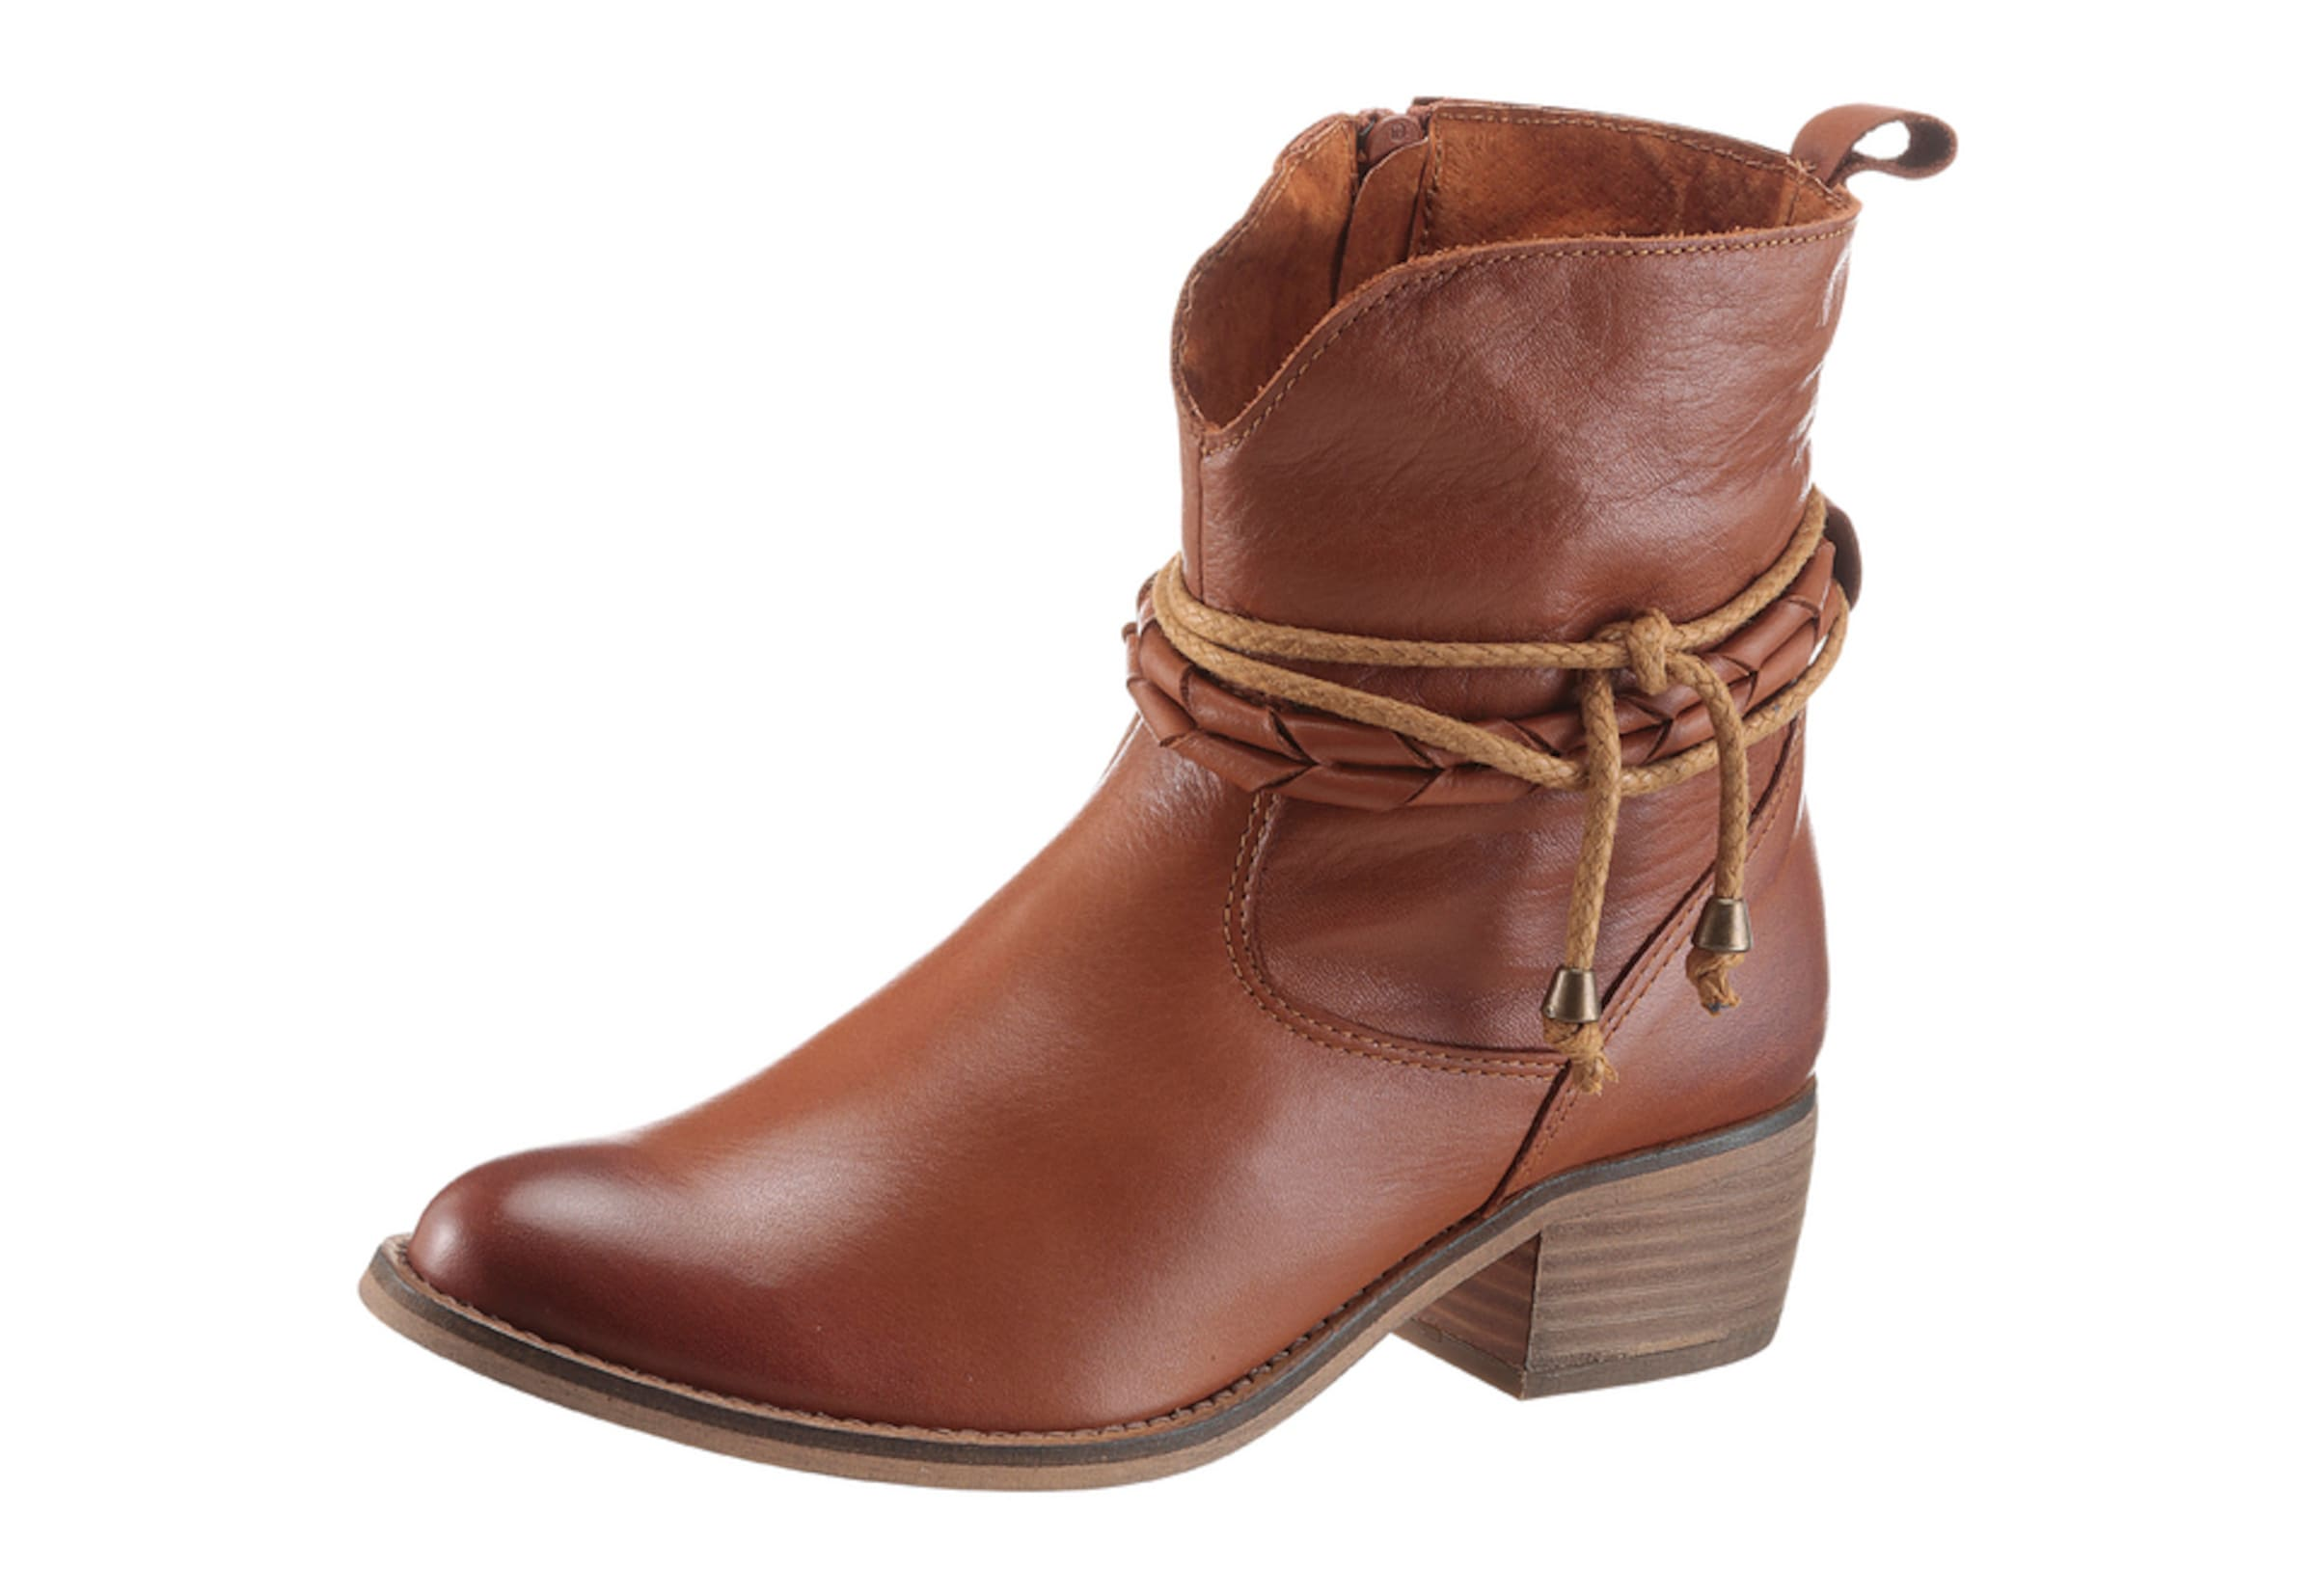 ANDREA CONTI CONTI ANDREA | Trachtenstiefelette mit Zierbänder Schuhe Gut getragene Schuhe d8de6b